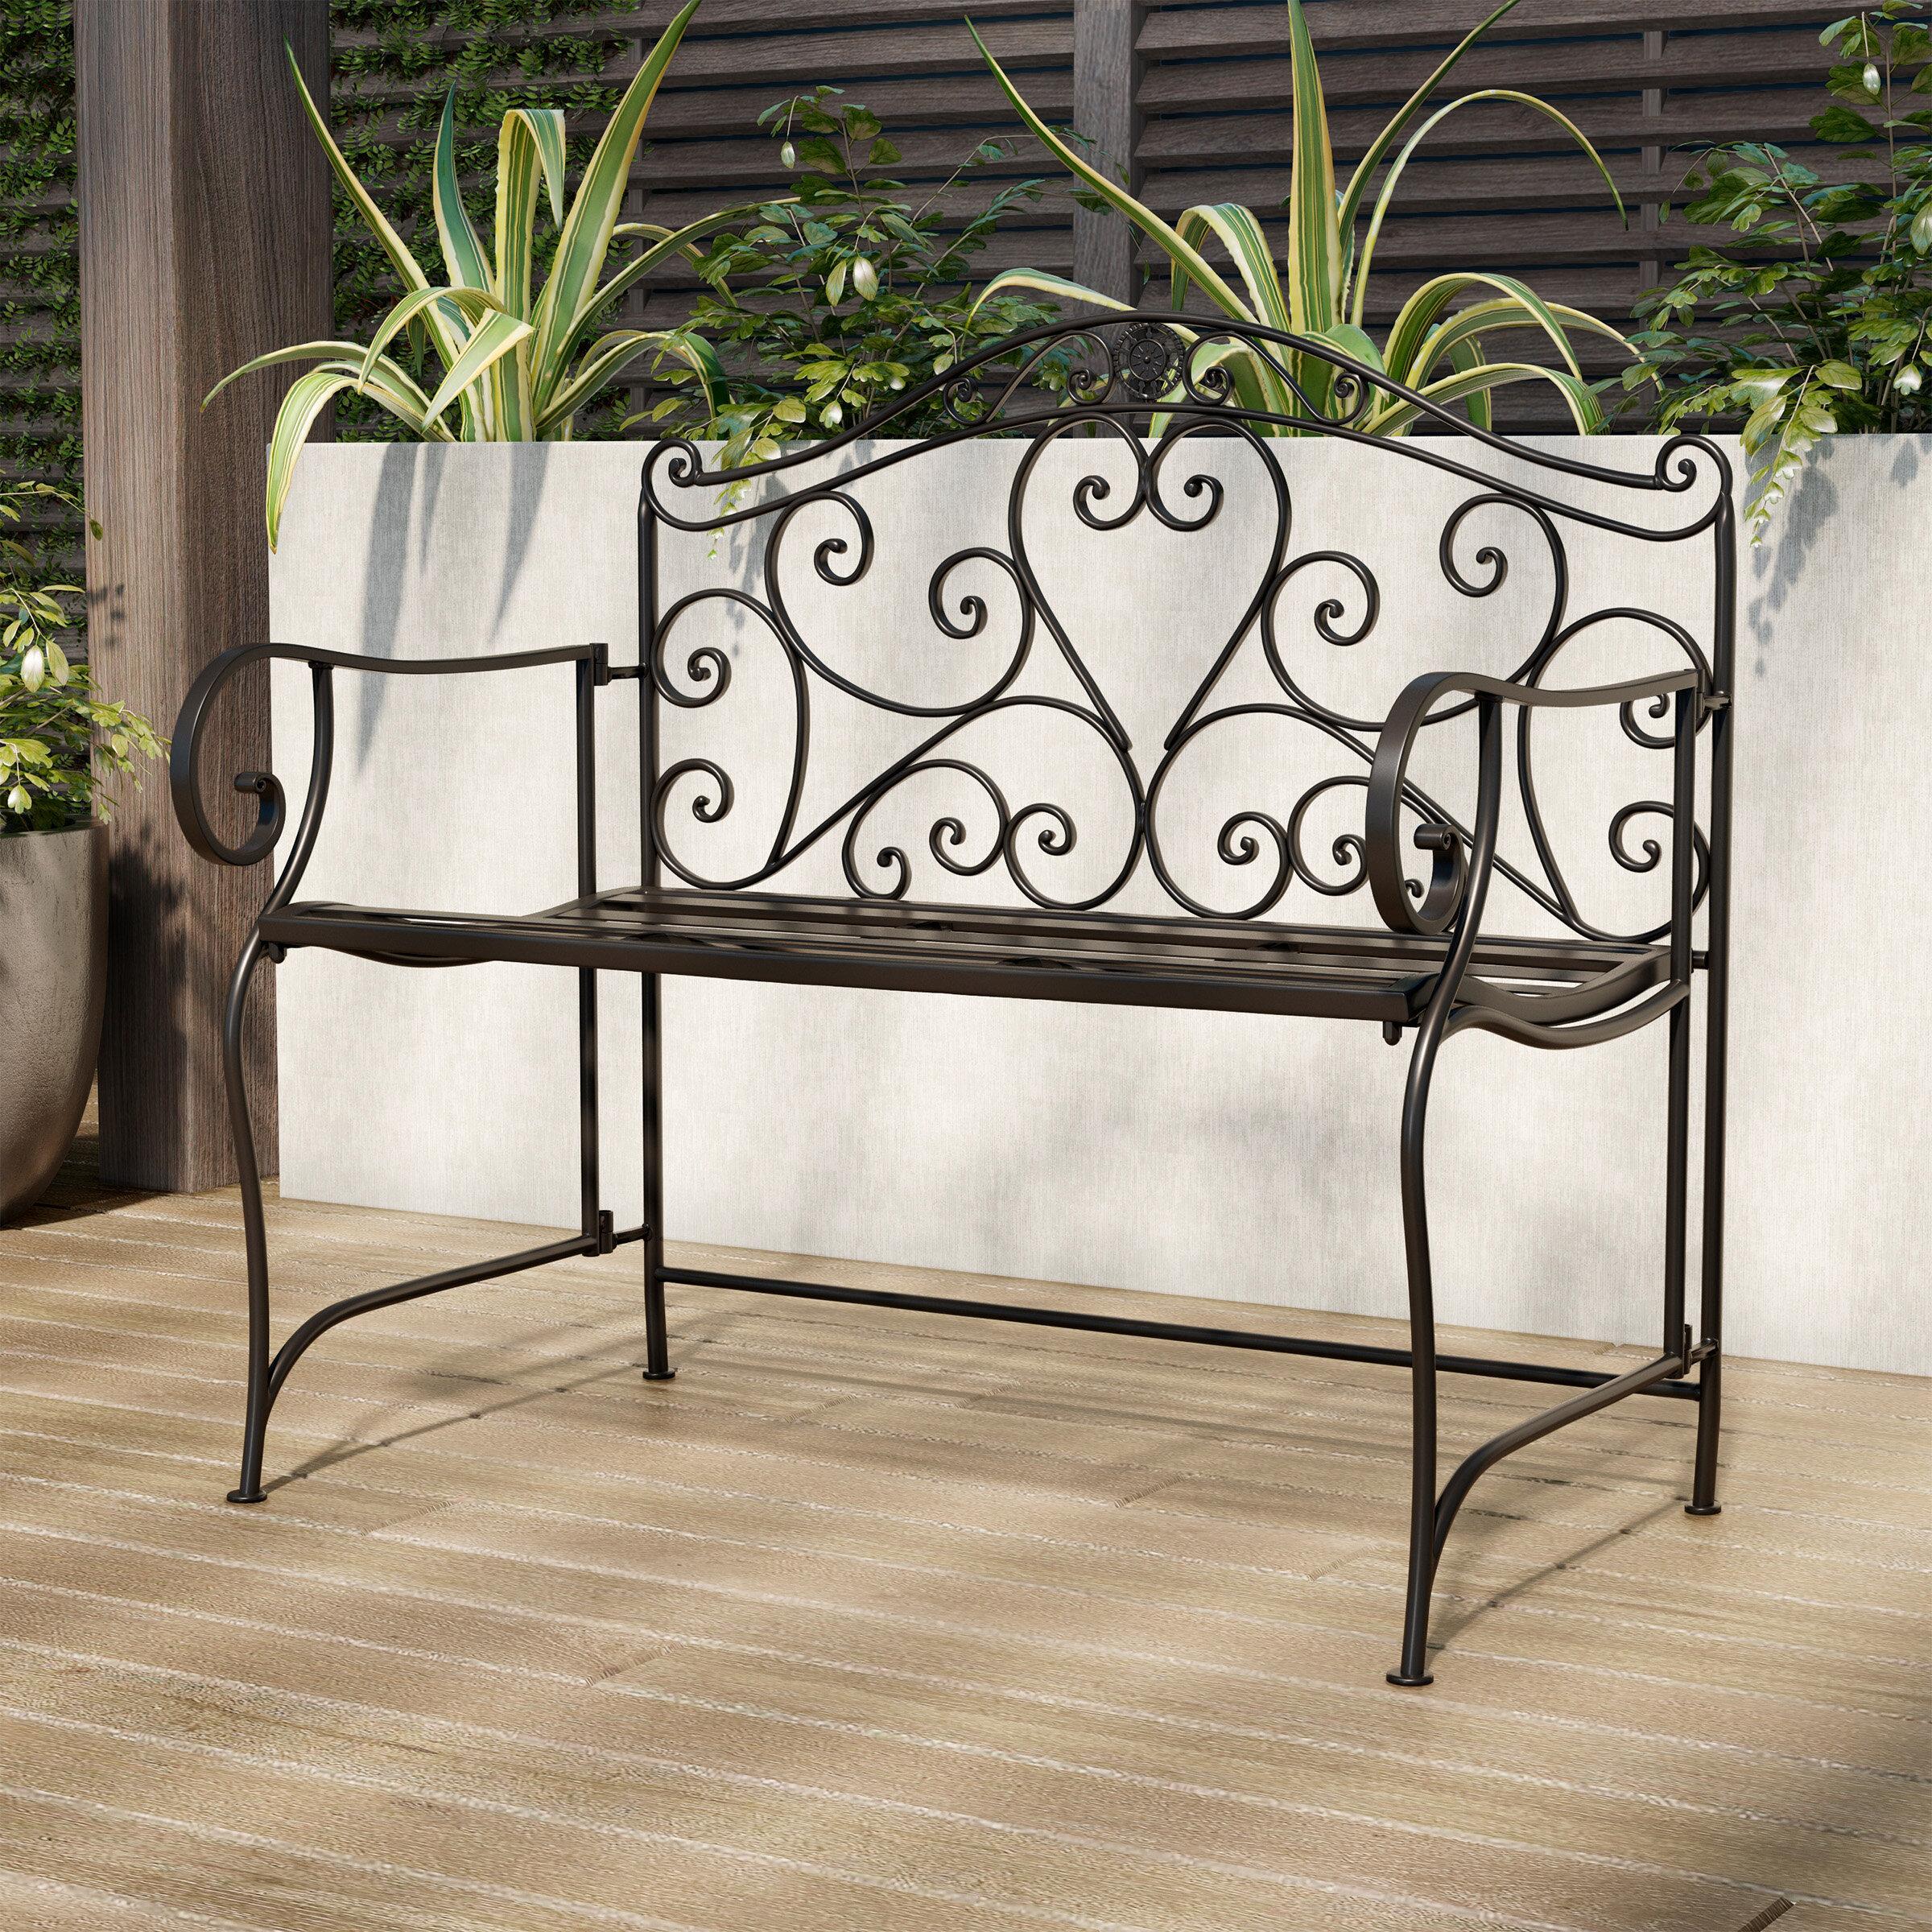 Outdoor Folding Bench | Wayfair